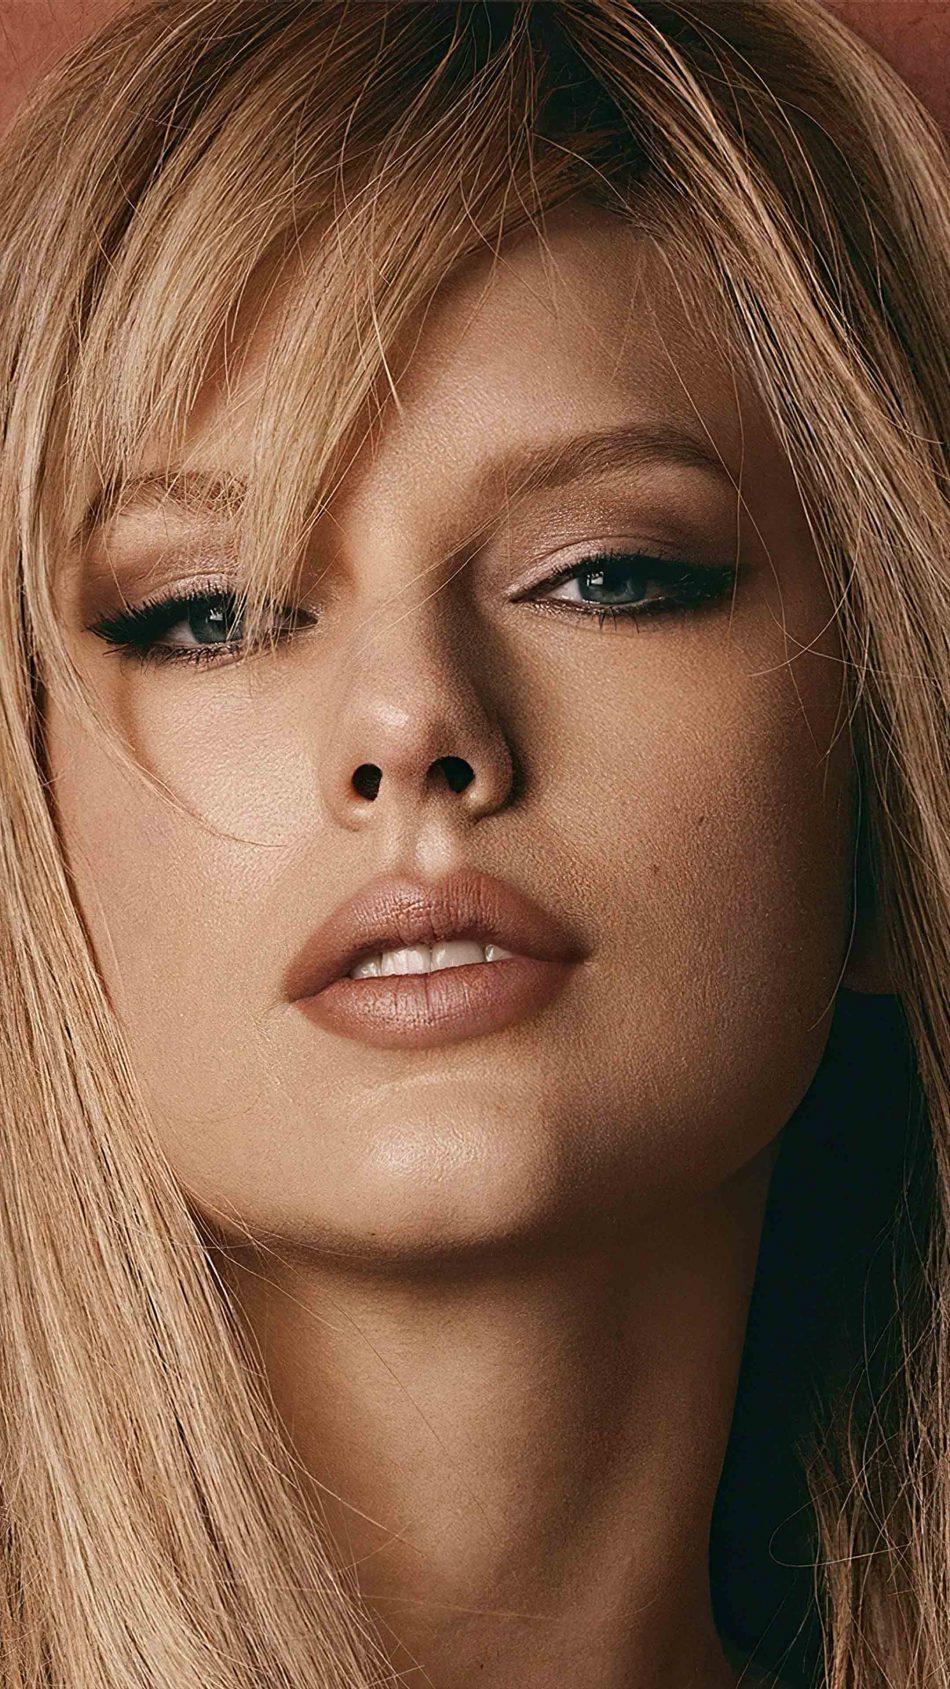 Taylor Swift 2020 4K Ultra HD Mobile Wallpaper 950x1689